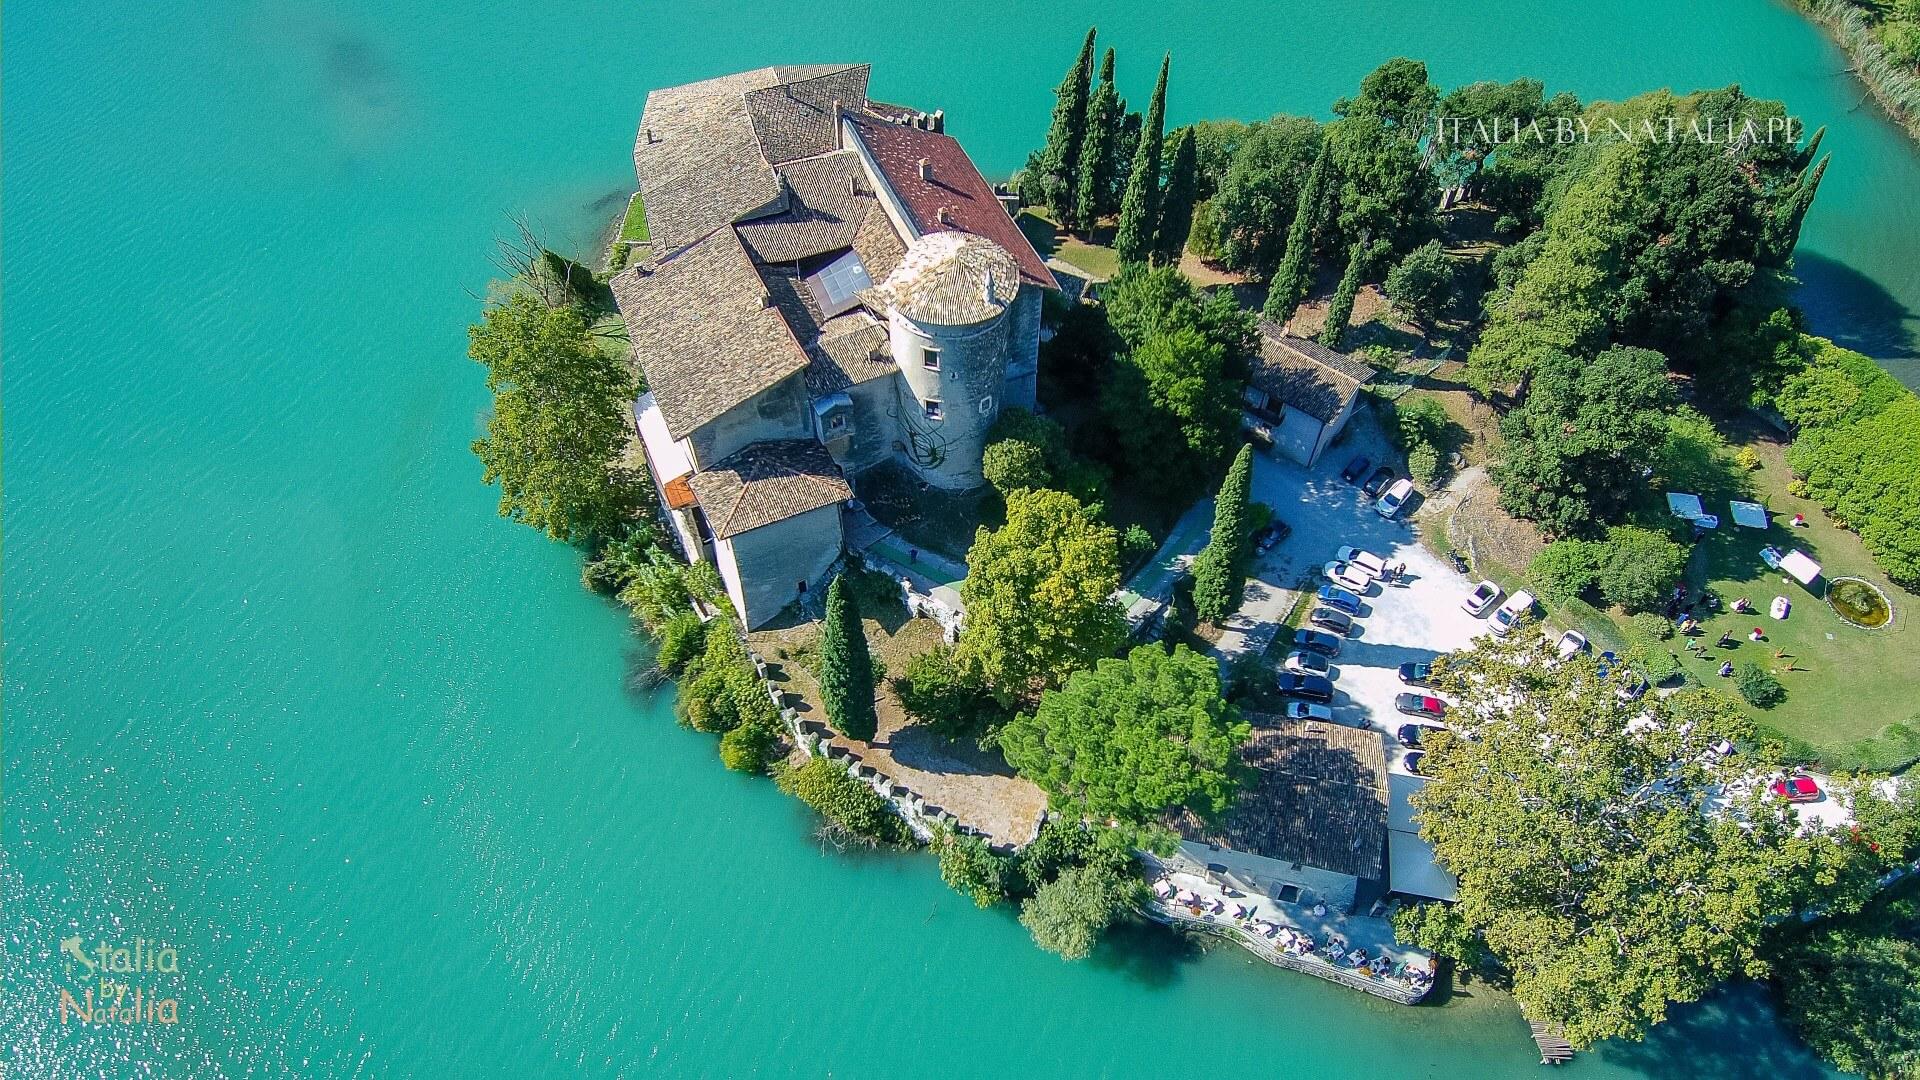 Jezioro Toblino Santa Massenza wycieczka na północ od Garda lake toblino Santa Massenza